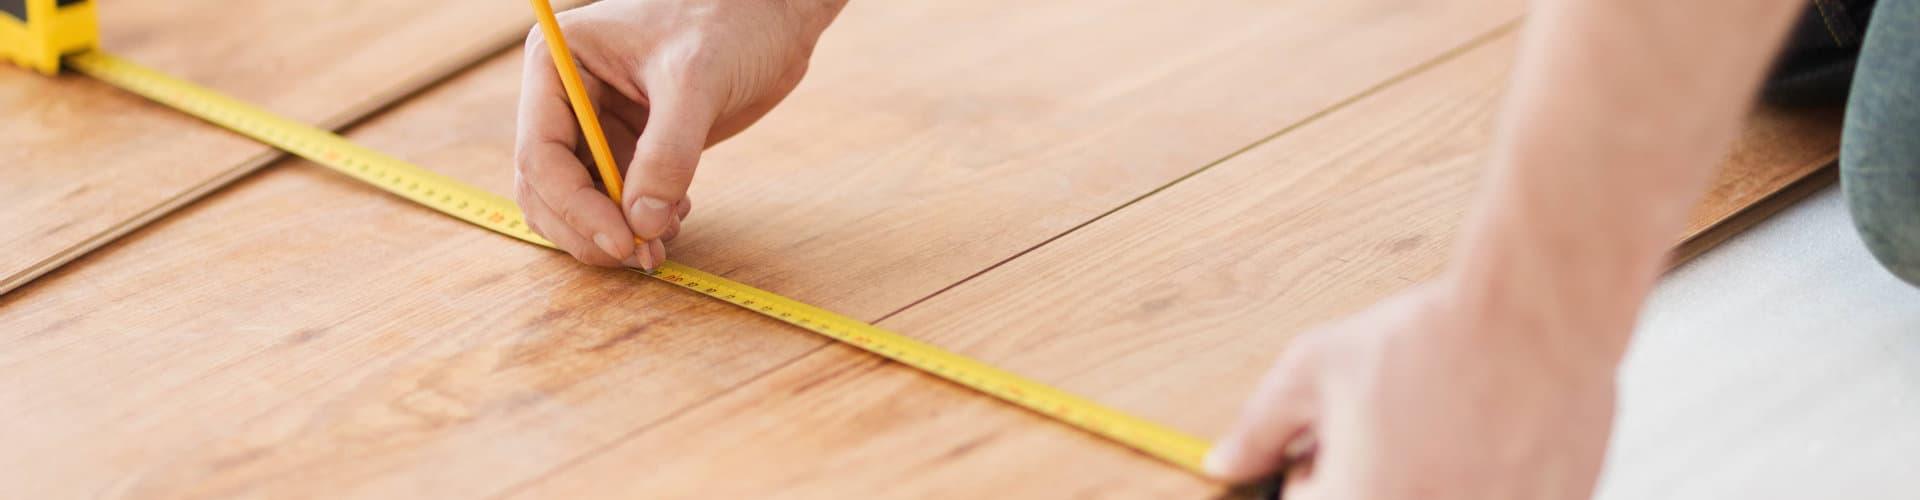 man measuring a floor